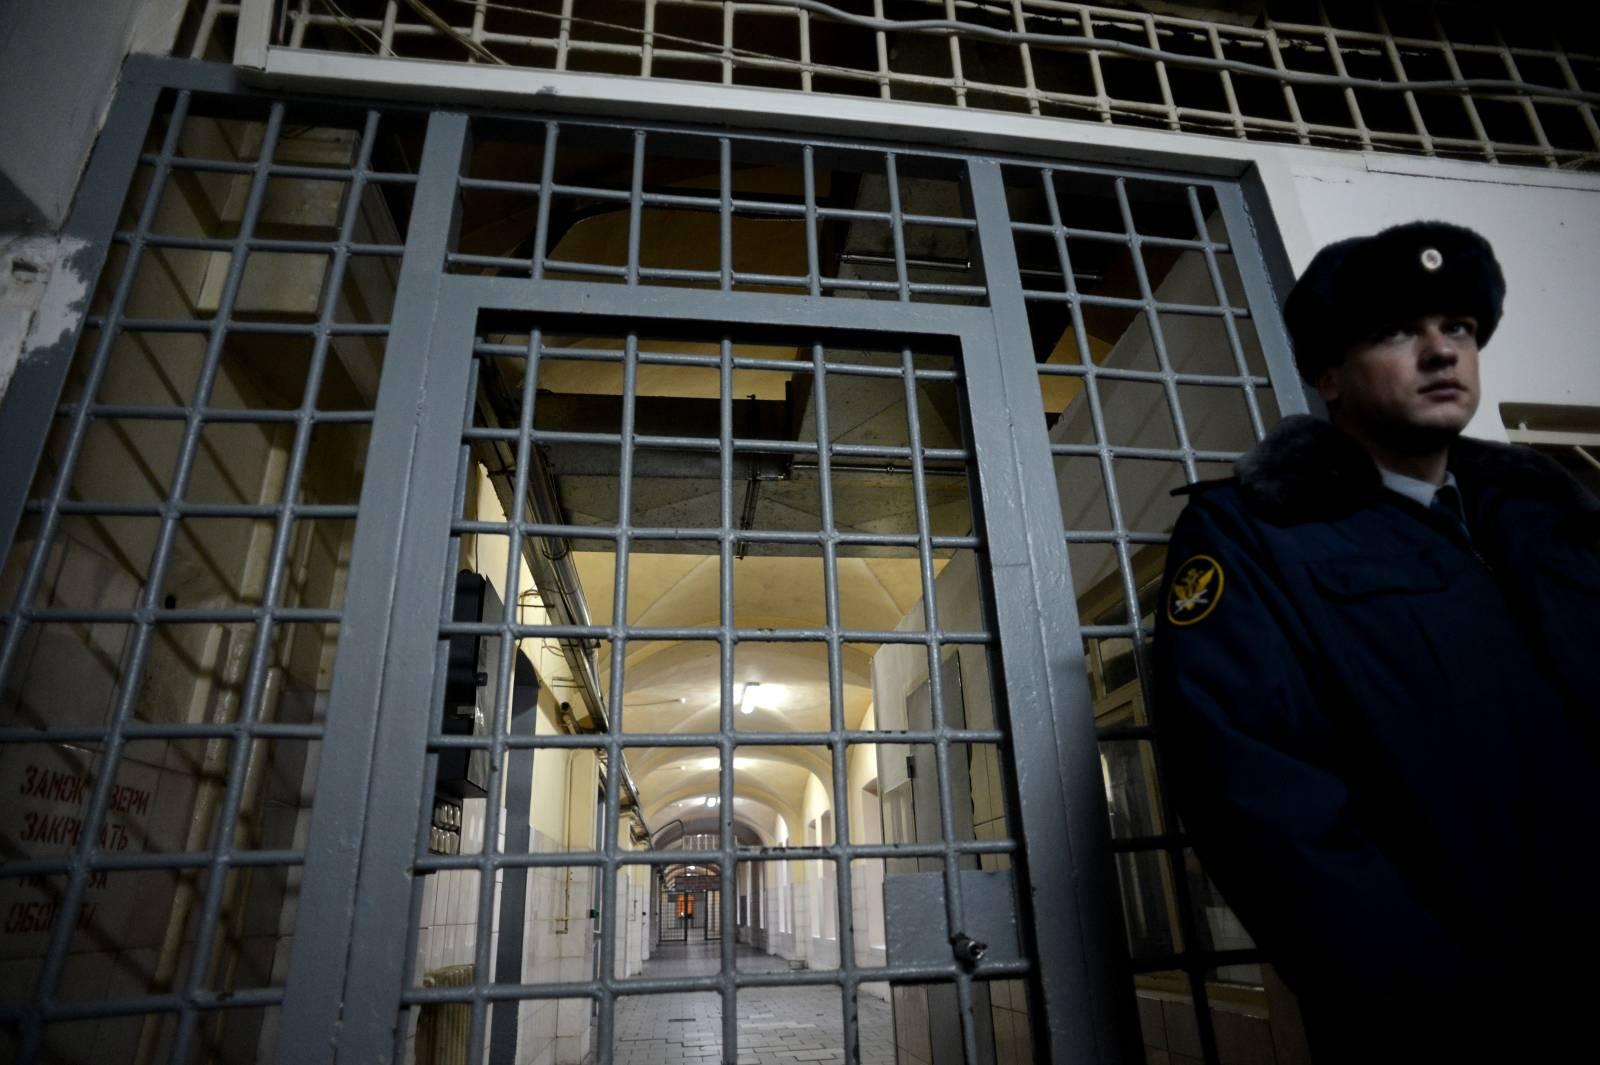 LLL - GFATF - Uzbek citizen jailed in Russian prison for online justification of terrorism